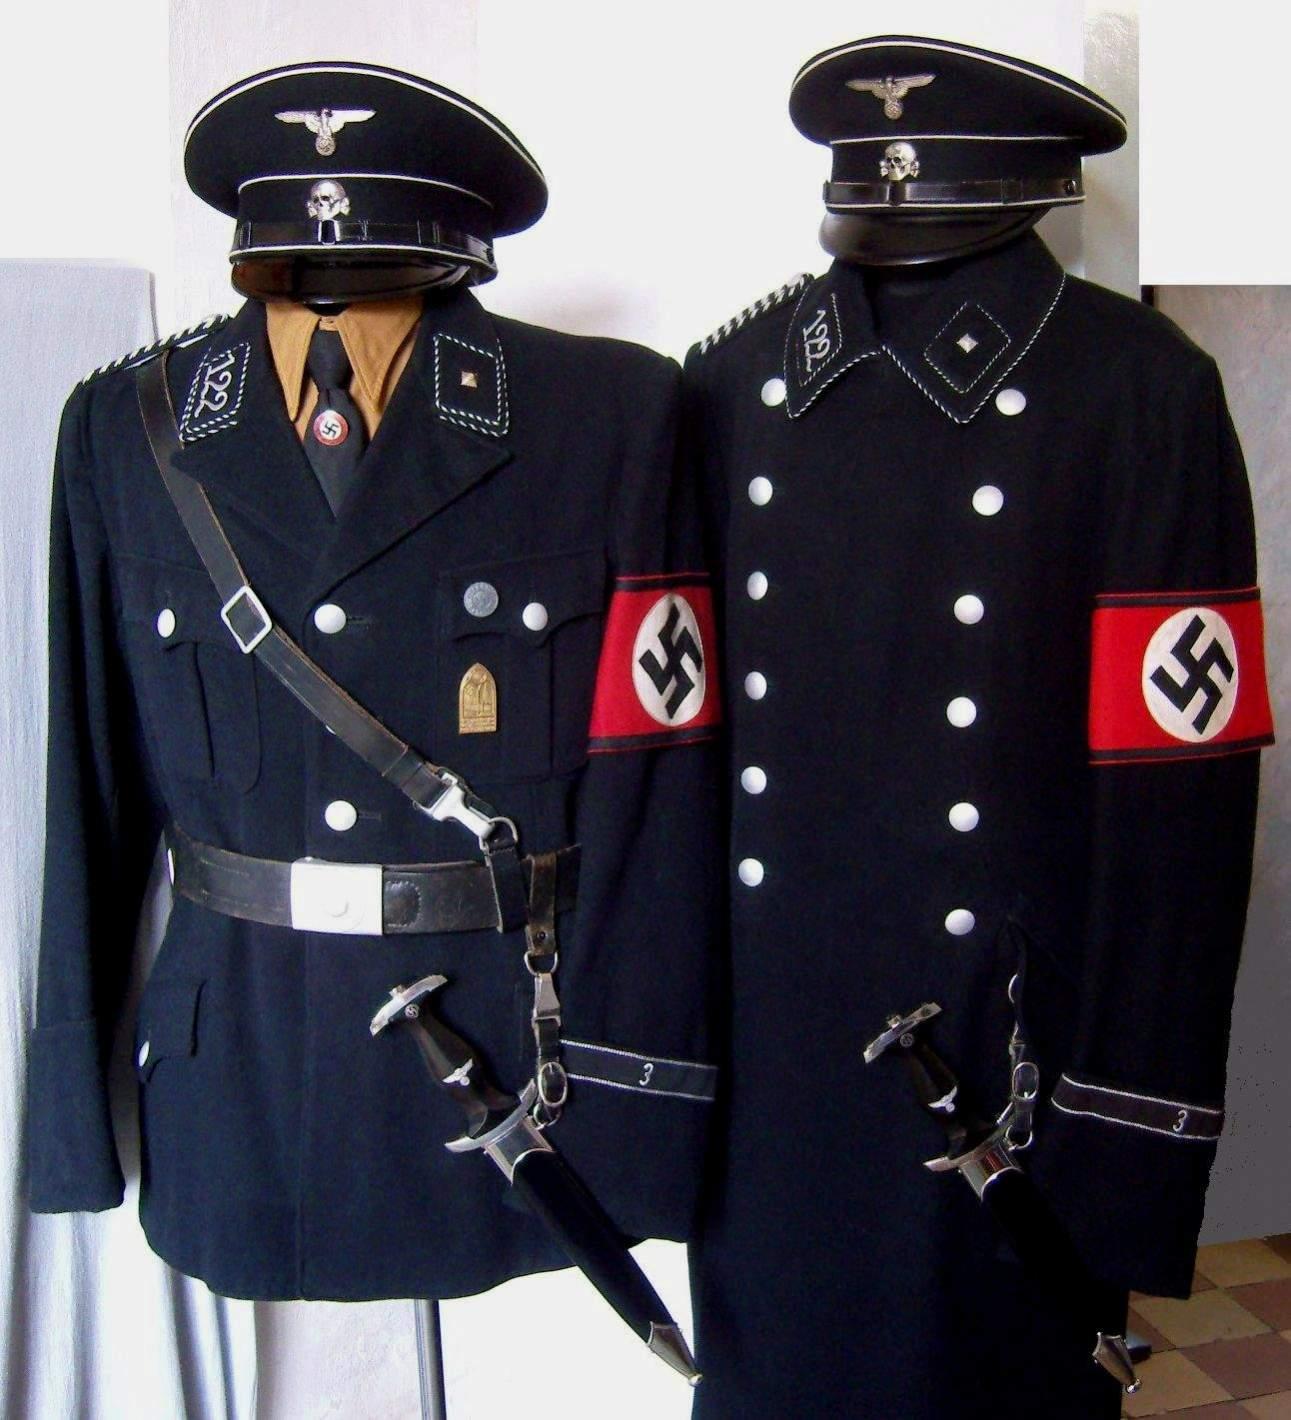 122 Best Images About Uniforms: Standarte 122 Strassburg